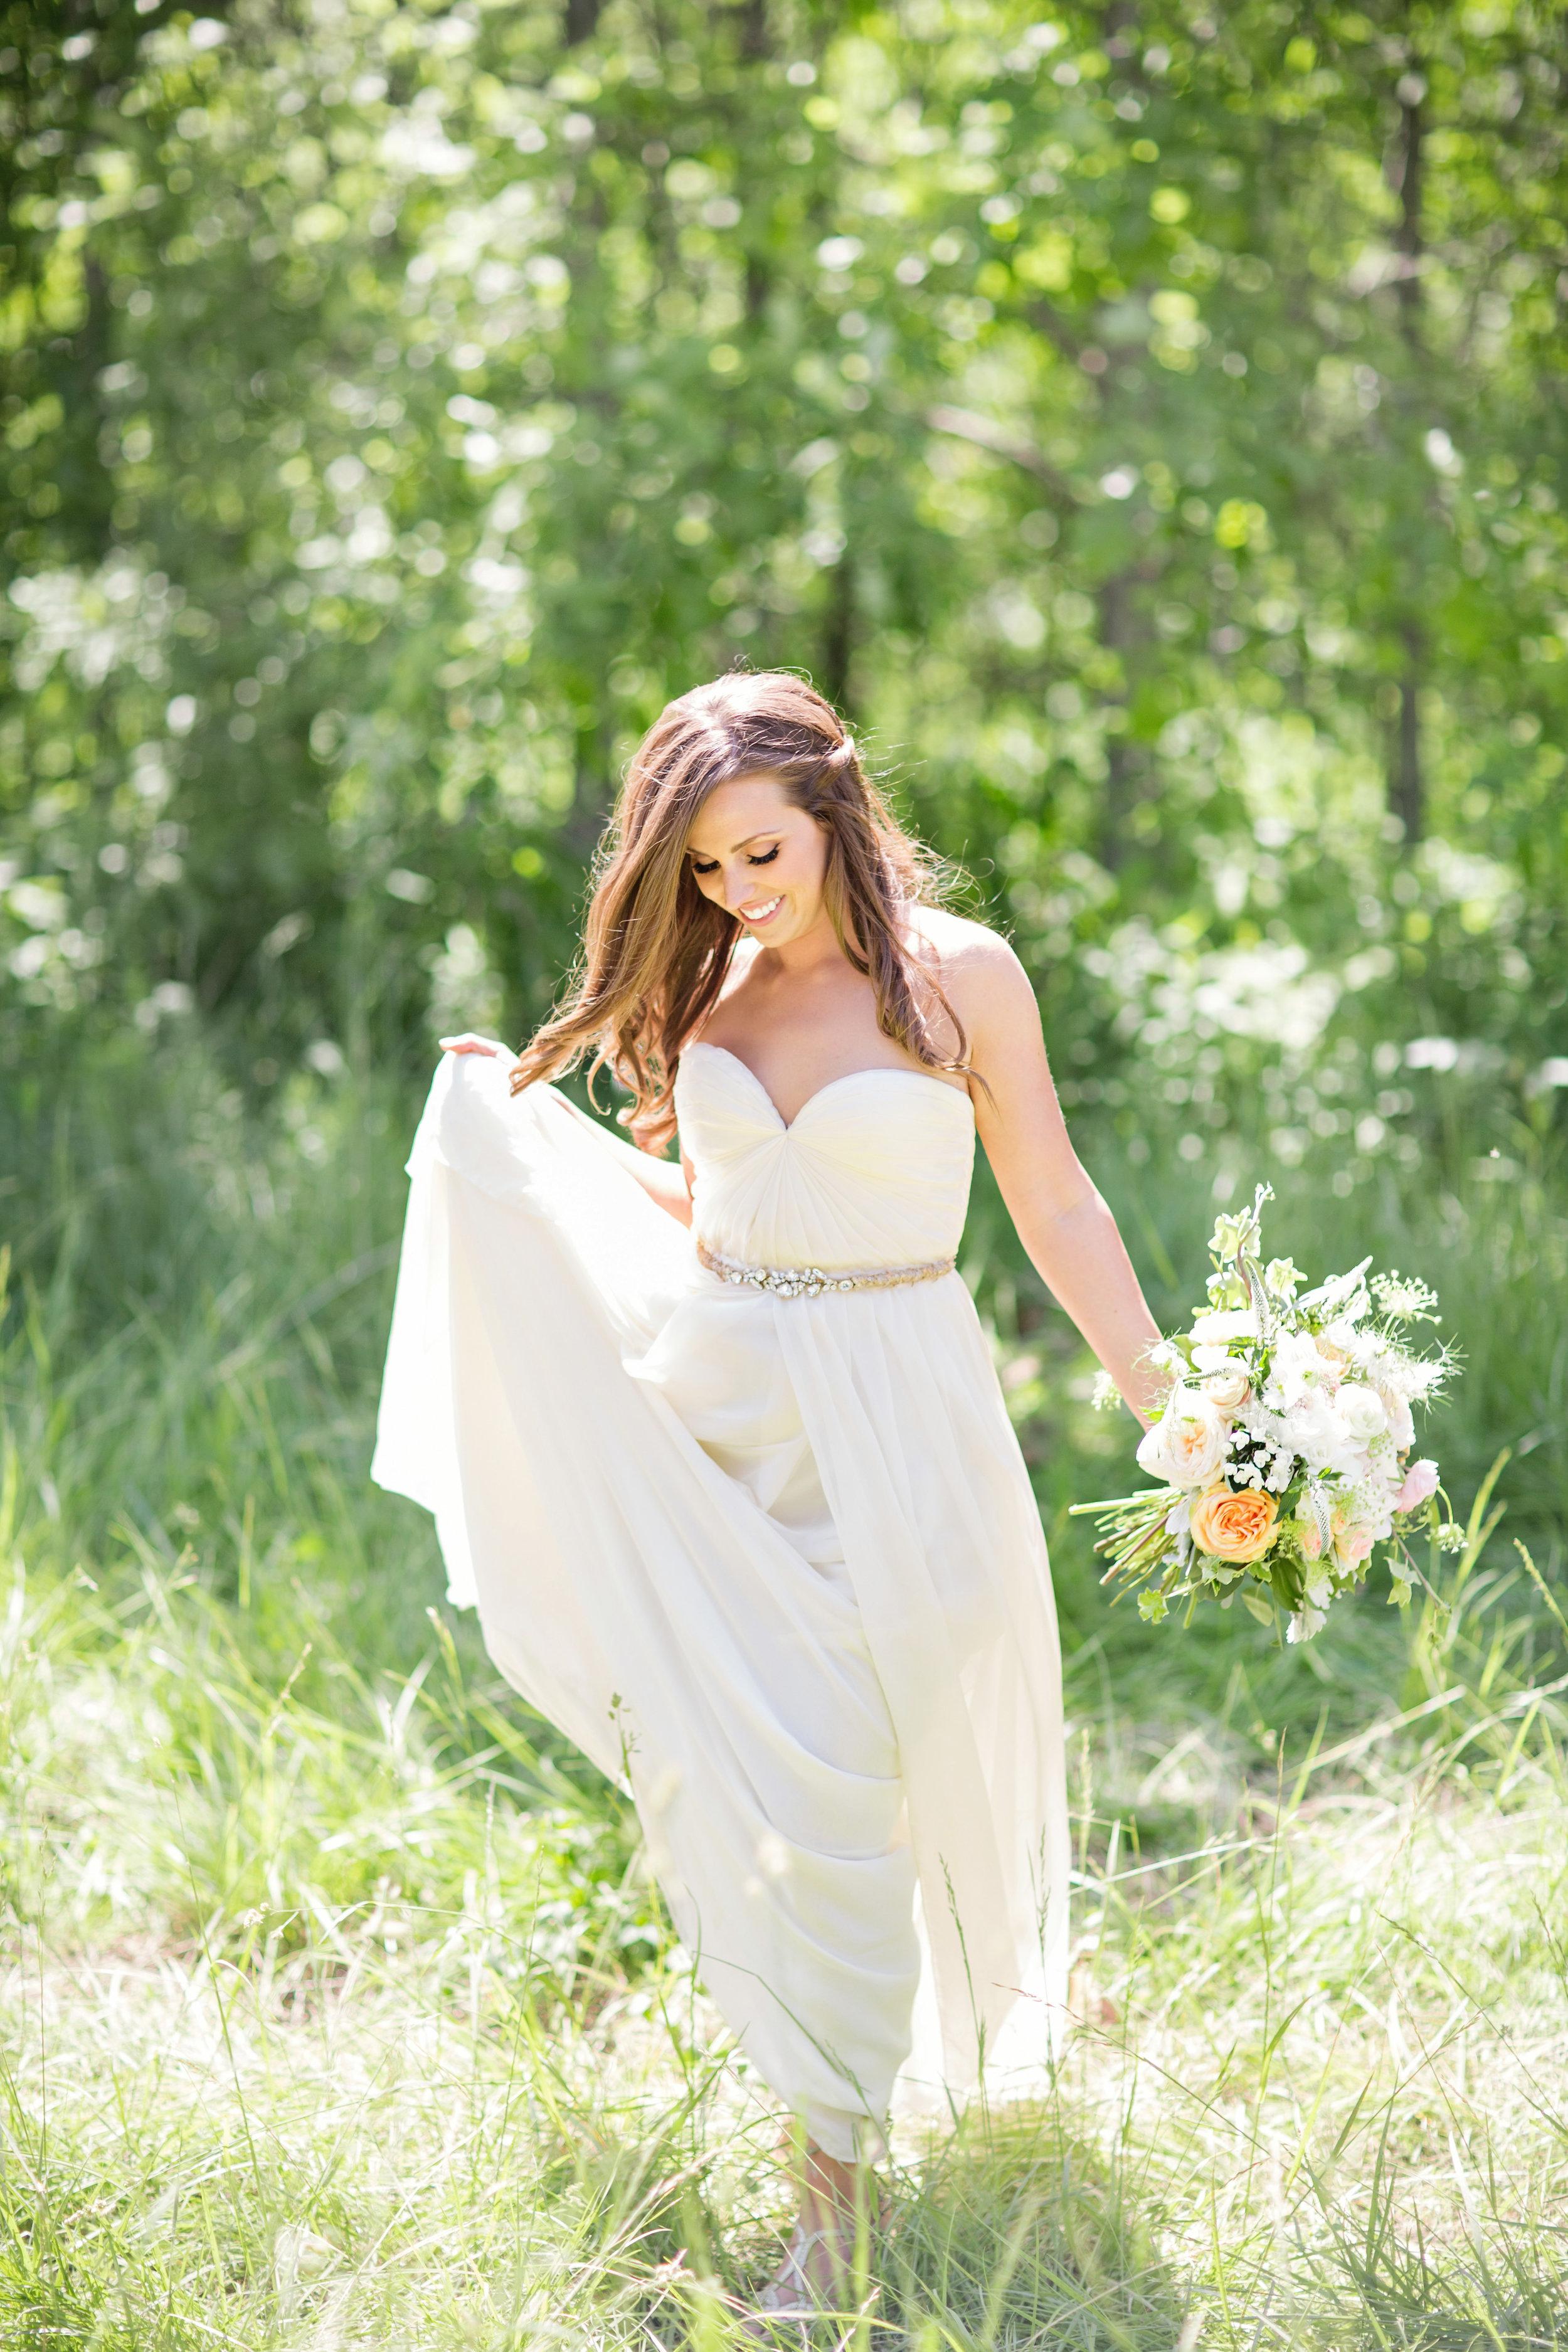 stylish-wedding-photography-windsor-toronto-ontario-wedding-photographer-winery-eryn-shea-photography-15.jpg